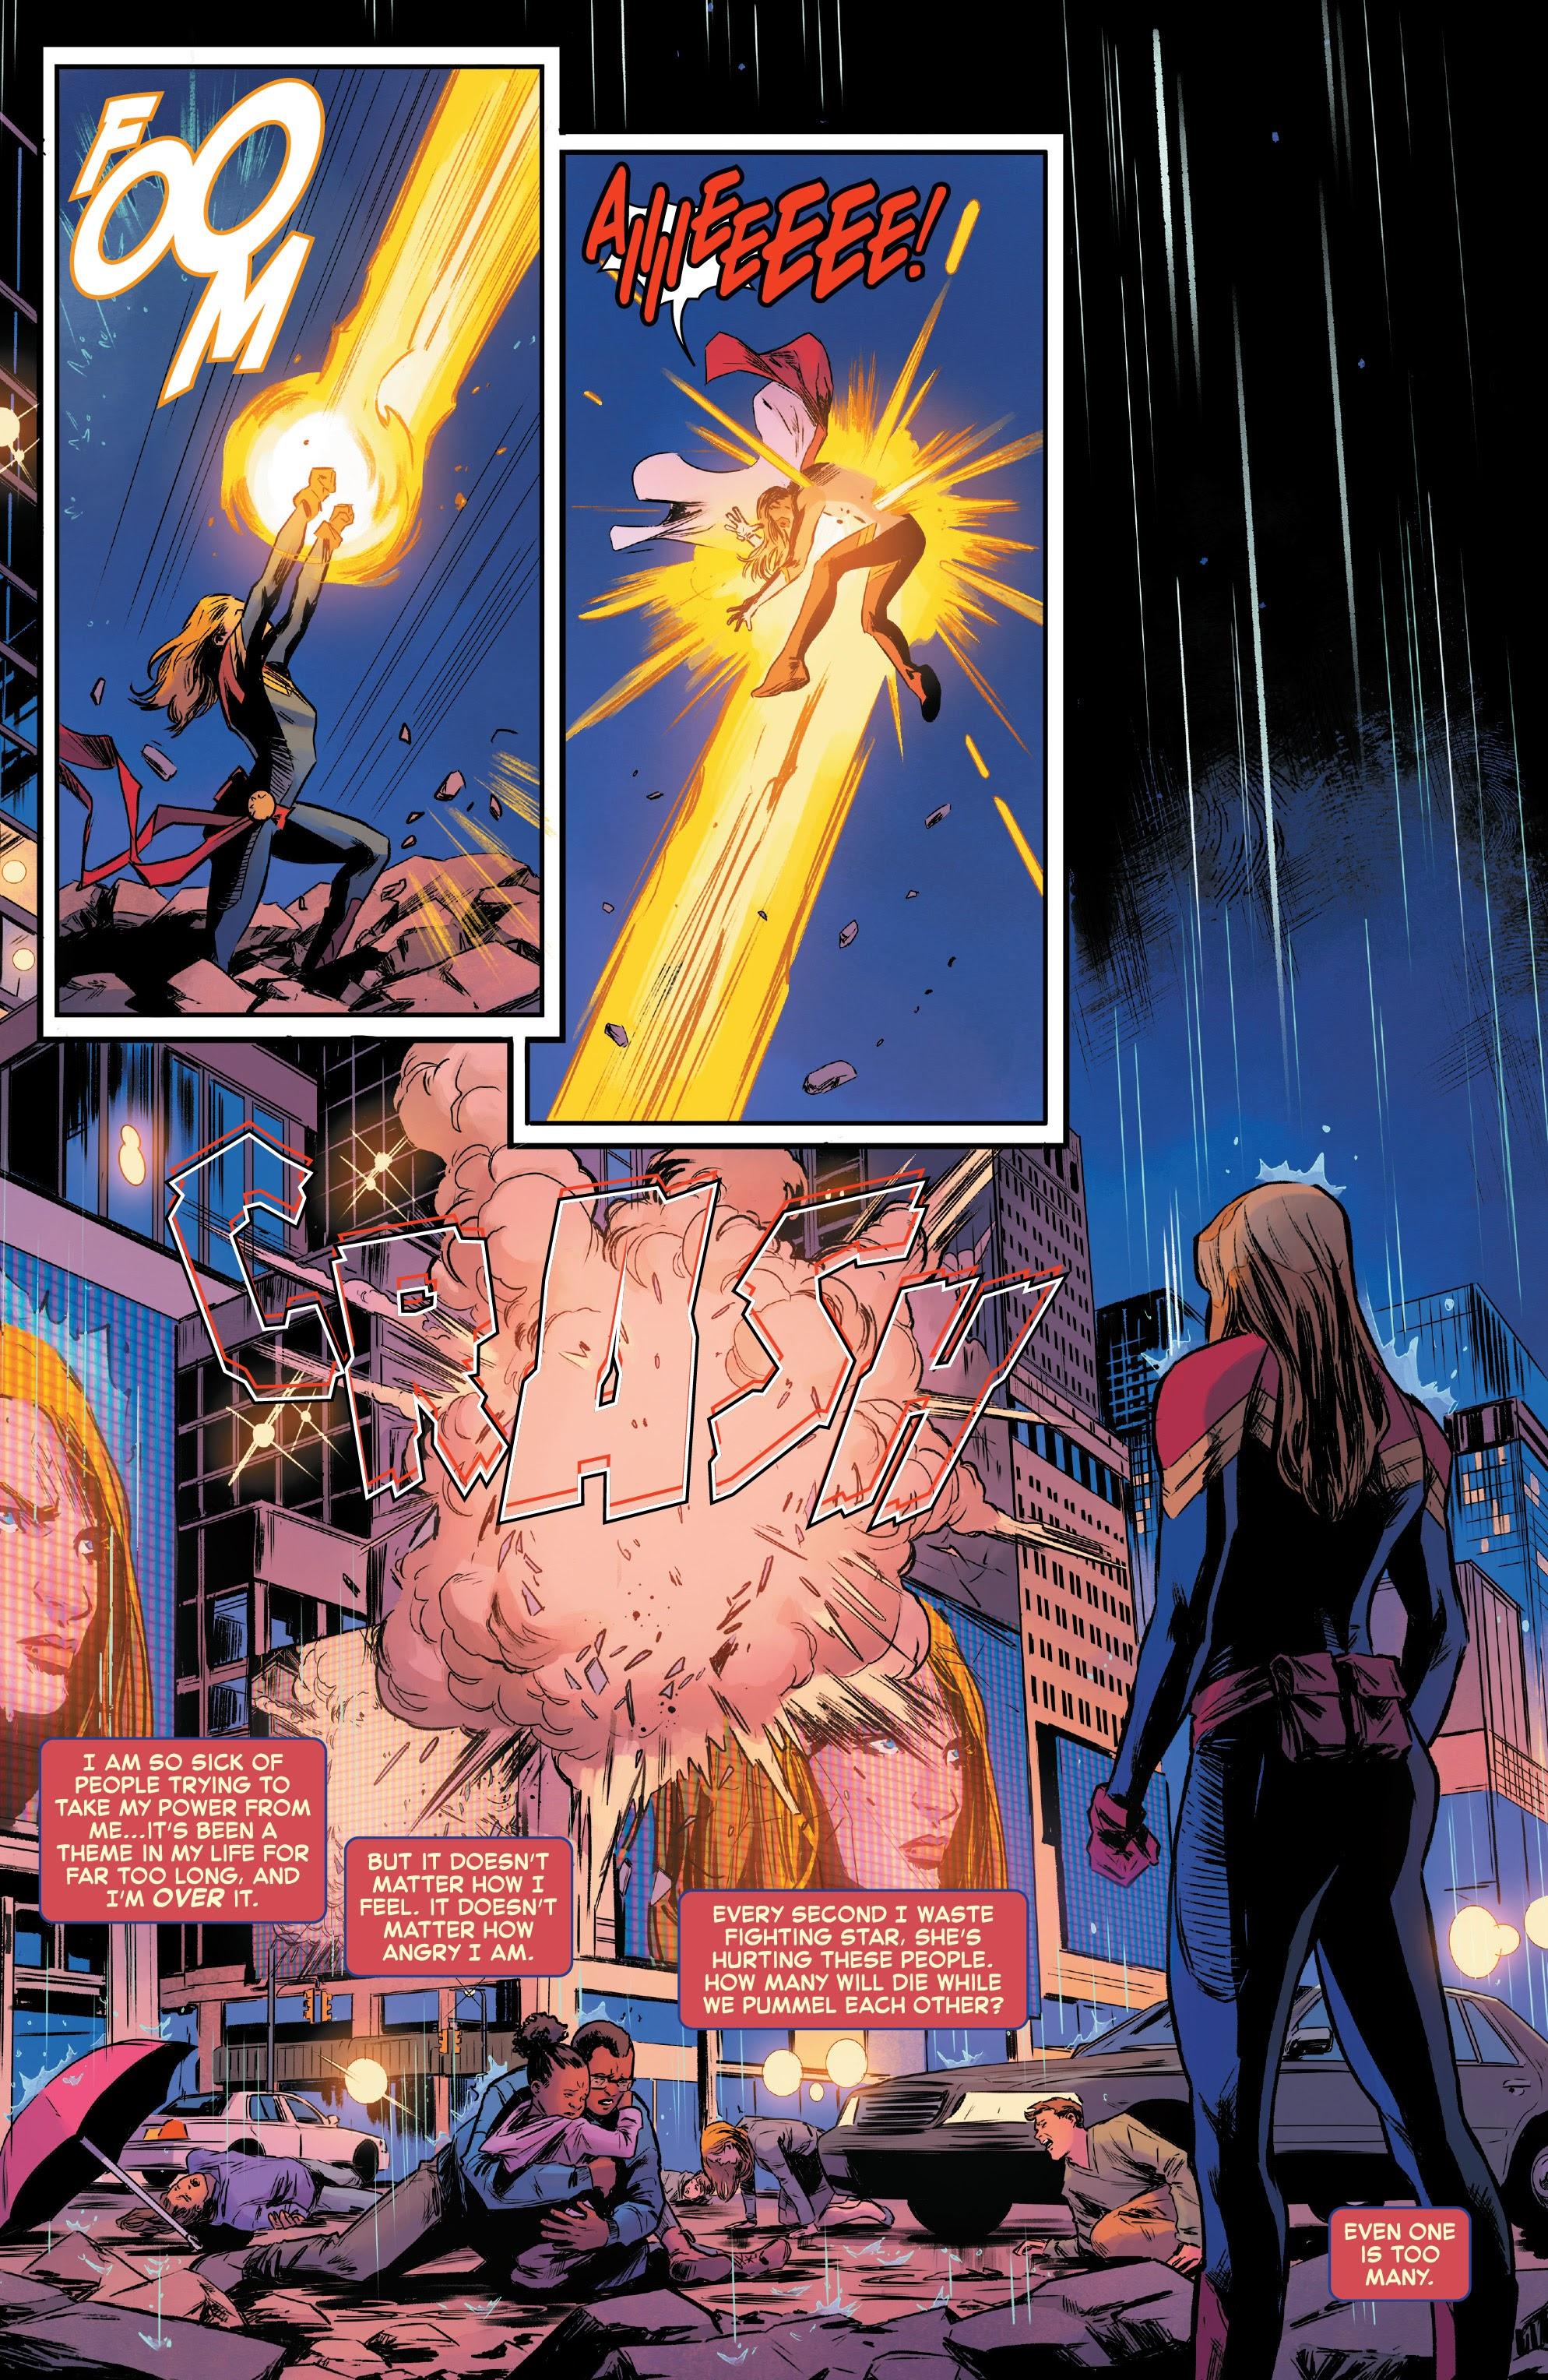 Captain Marvel (2019) #11 - Read Captain Marvel (2019 ...